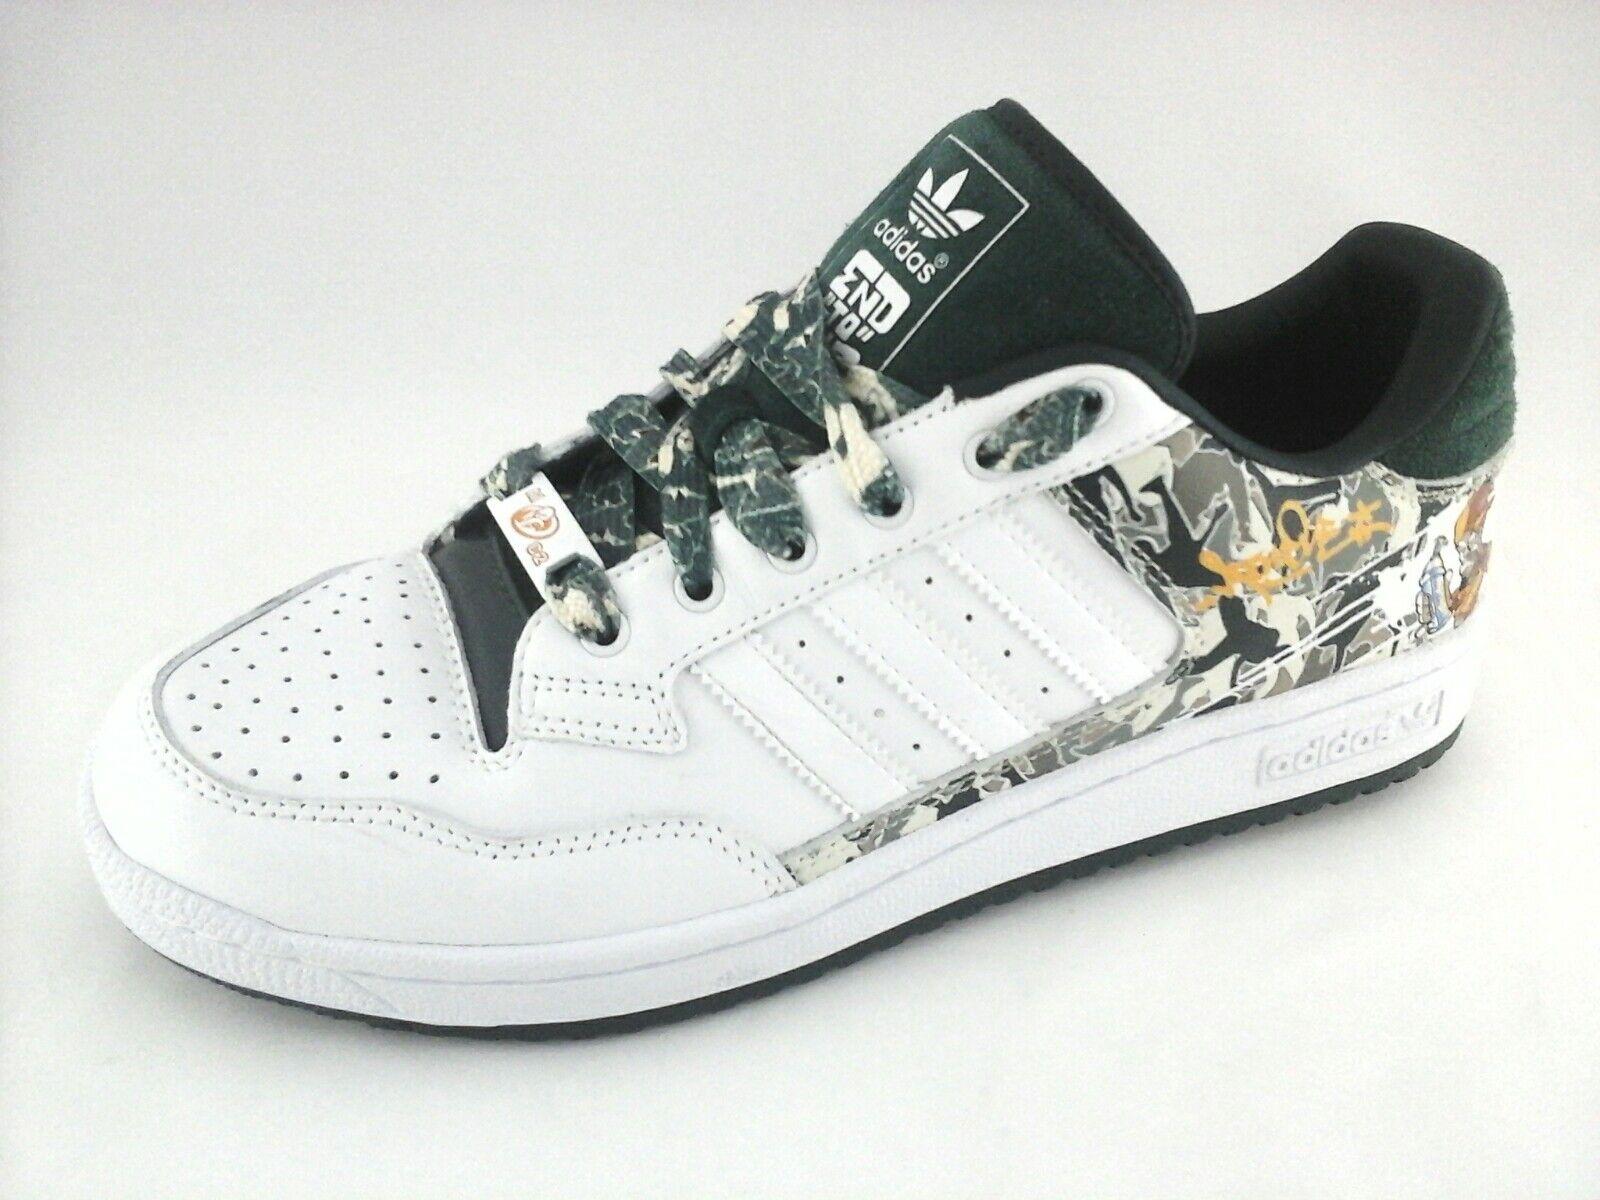 Adidas Zapatillas de extremo a extremo 017689 hip zapatillas de skate graffiti hip 017689 hop Verde / blanco Hombres 576d89